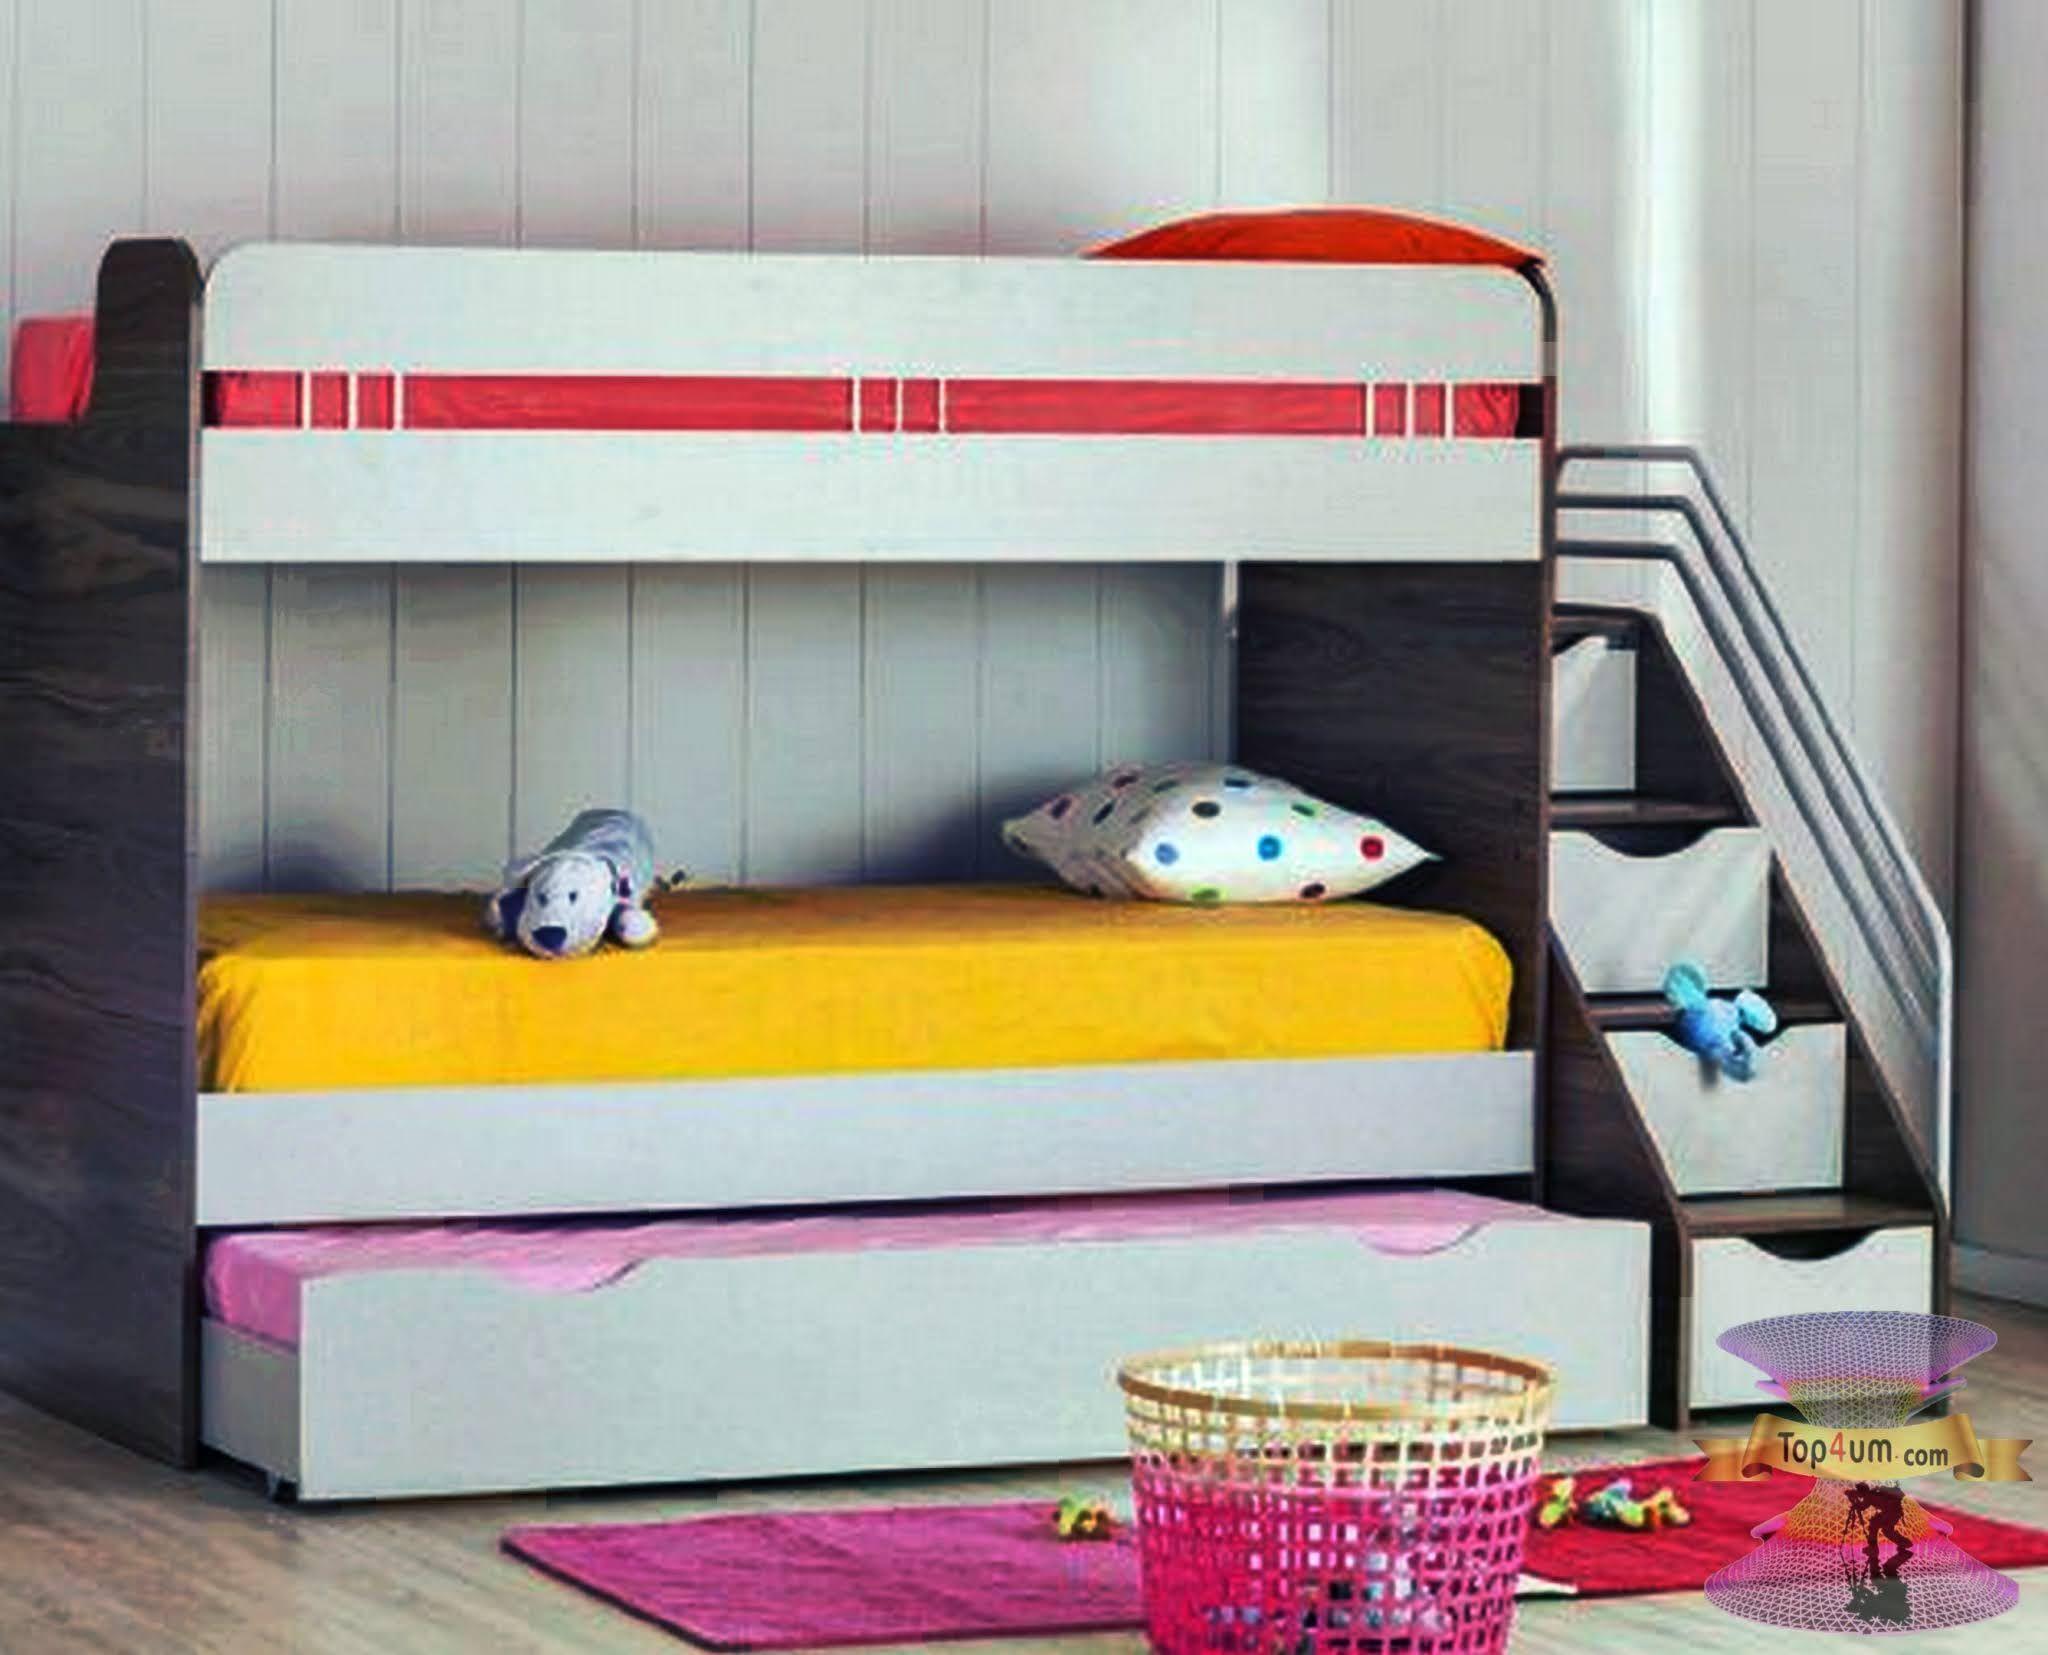 غرف نوم اطفال دورين مودرن Top4 Kids Bunk Beds Bed Bunk Beds